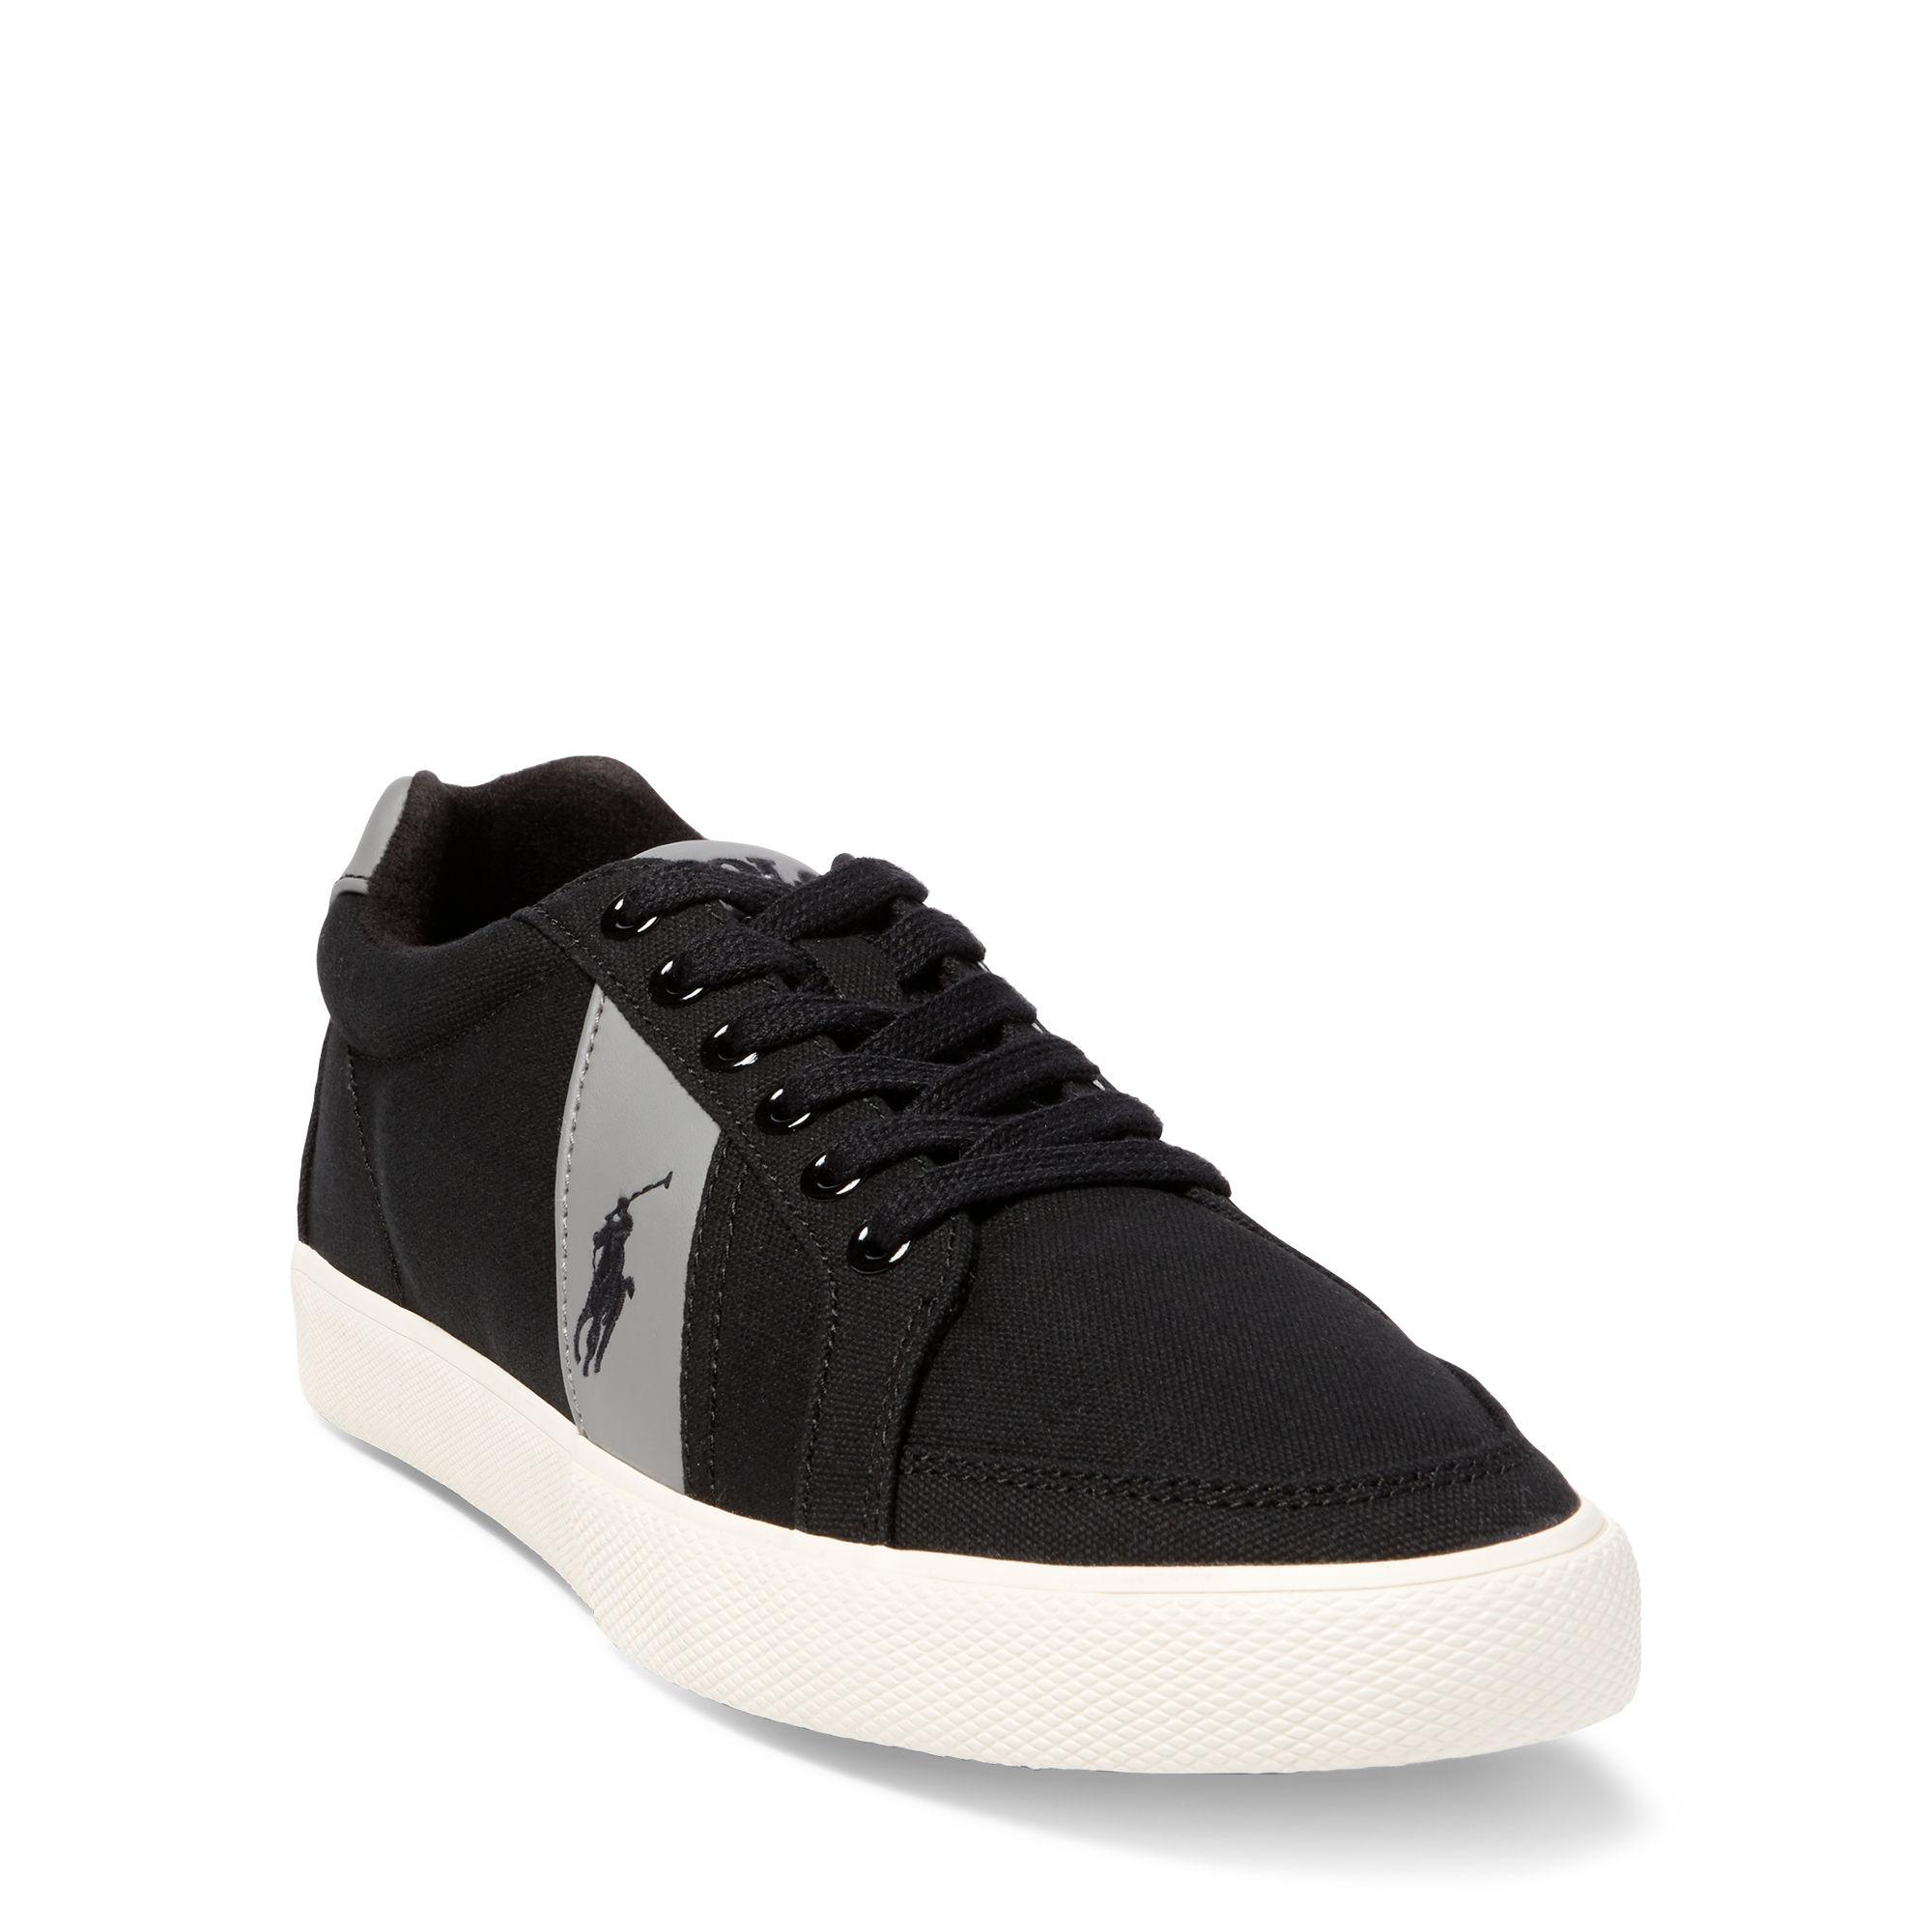 Ralph Lauren 20% Off Coupon: Women's Tees $12+, Men's Sneakers  from $16 & More + Free S&H w/ Shoprunner